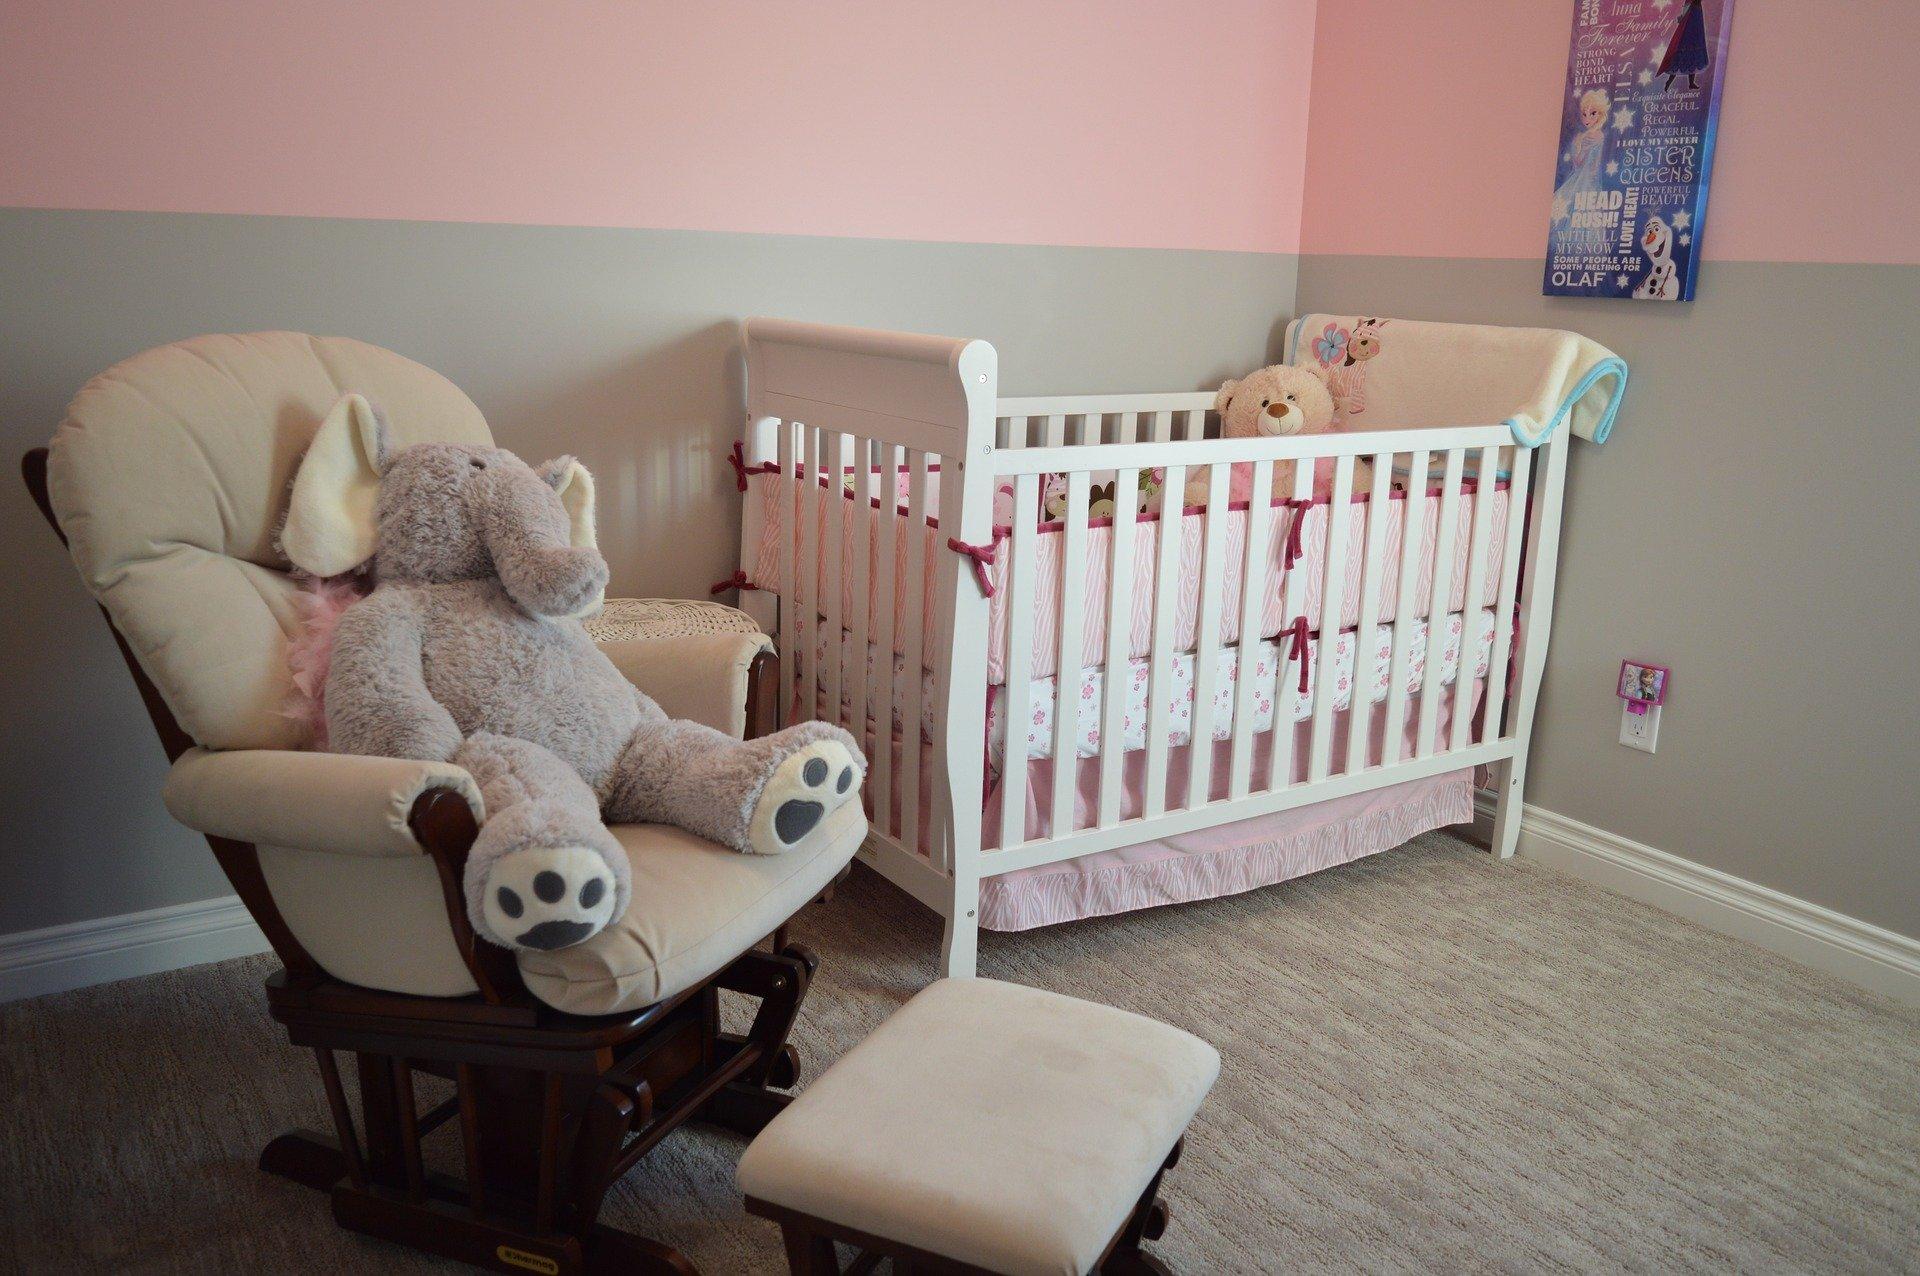 camera de bebelus